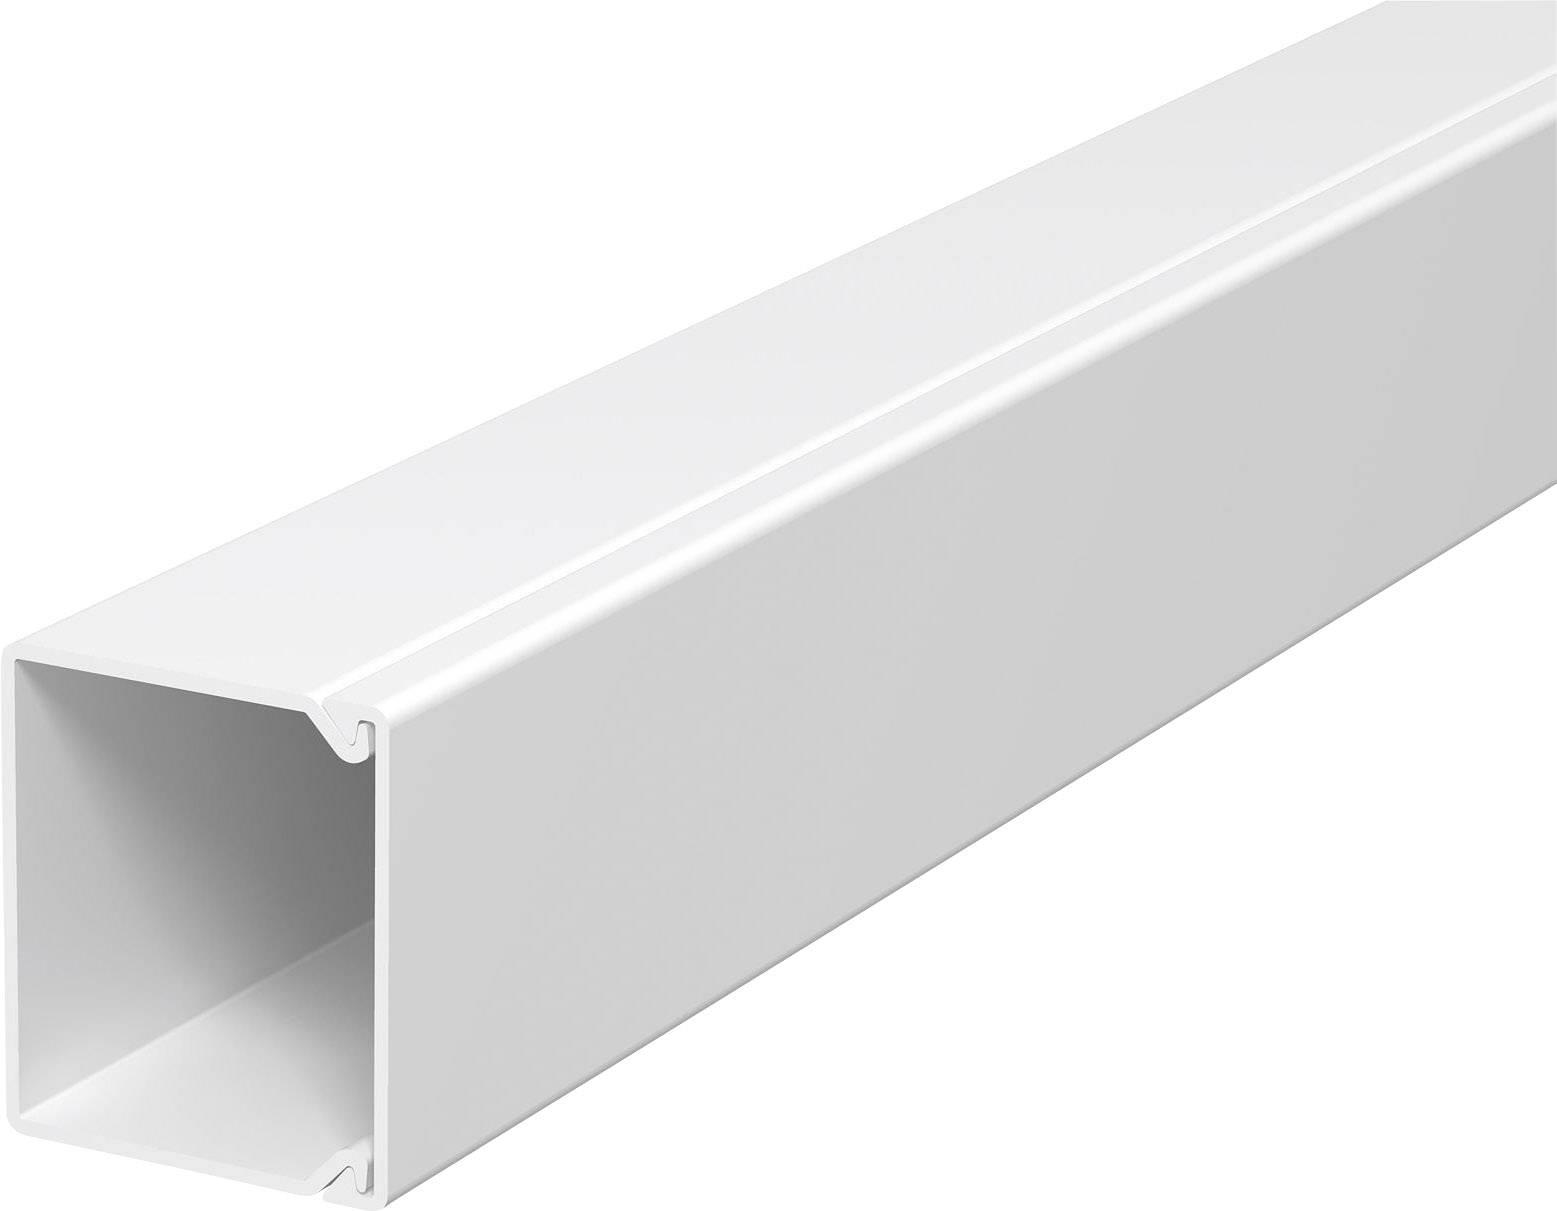 Elektroinstalační lišta s krytem OBO Bettermann, 6189520, 40 x 40 mm, 2 m, šedá